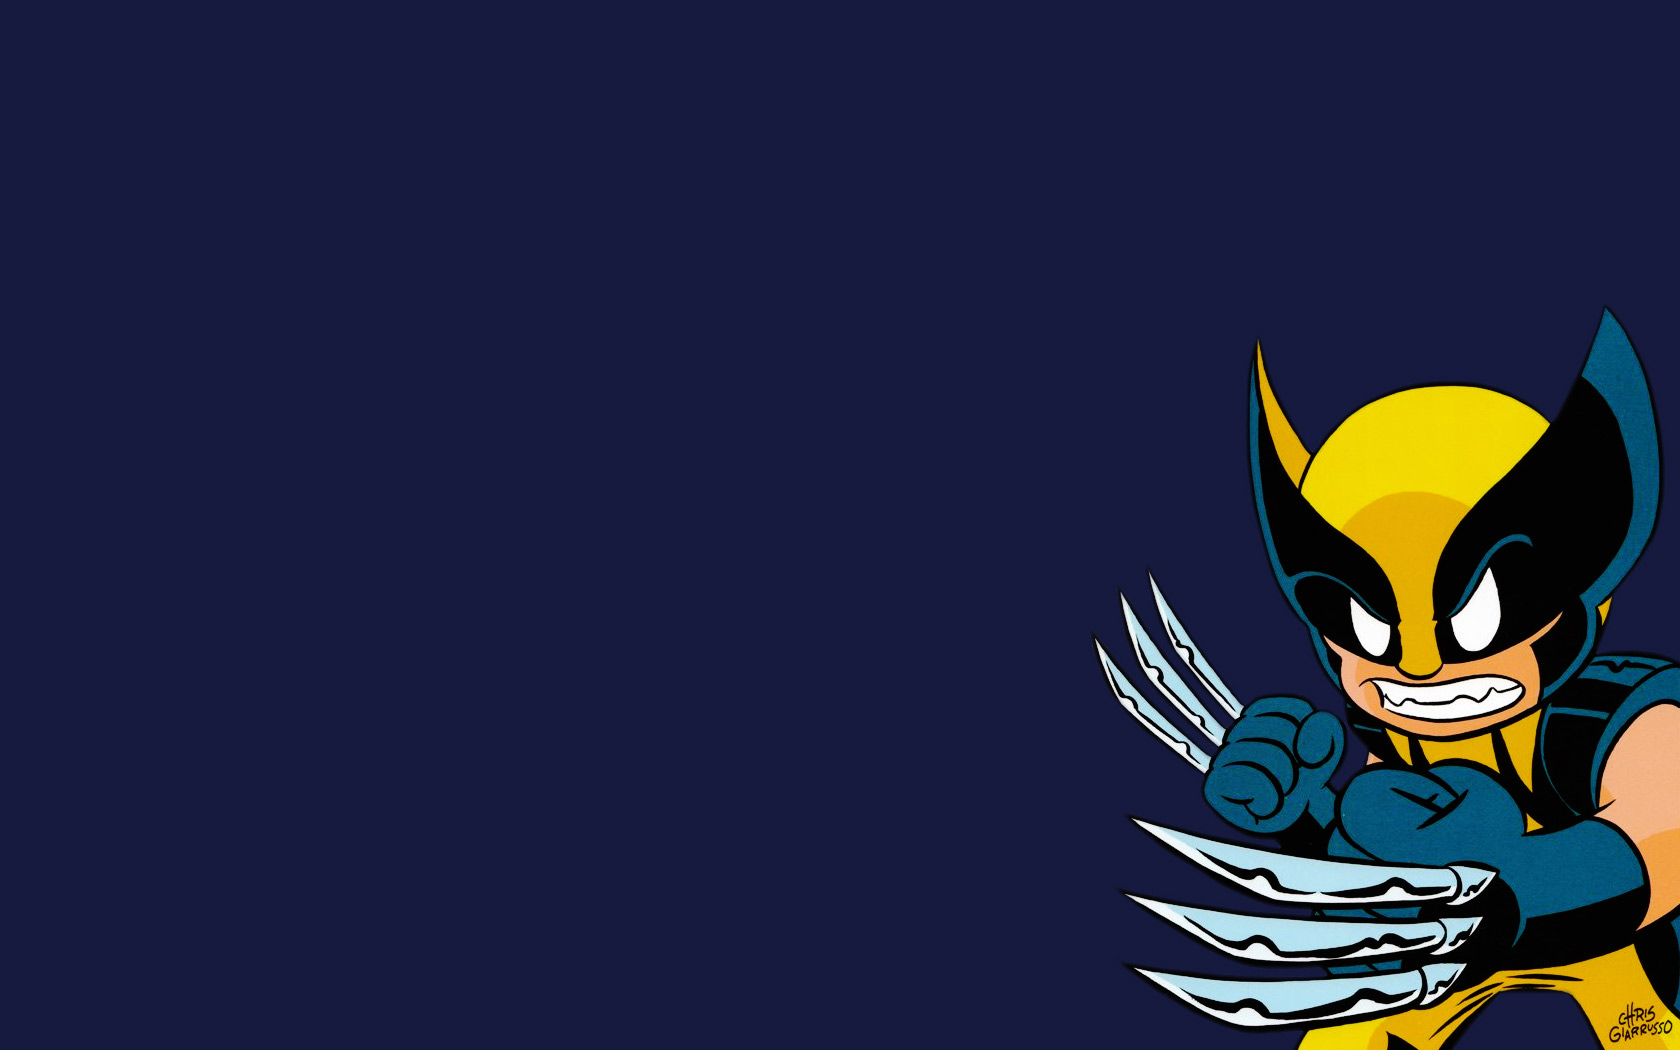 Download X Men Wolverine Wallpaper 1680x1050 Wallpoper 381385 1680x1050